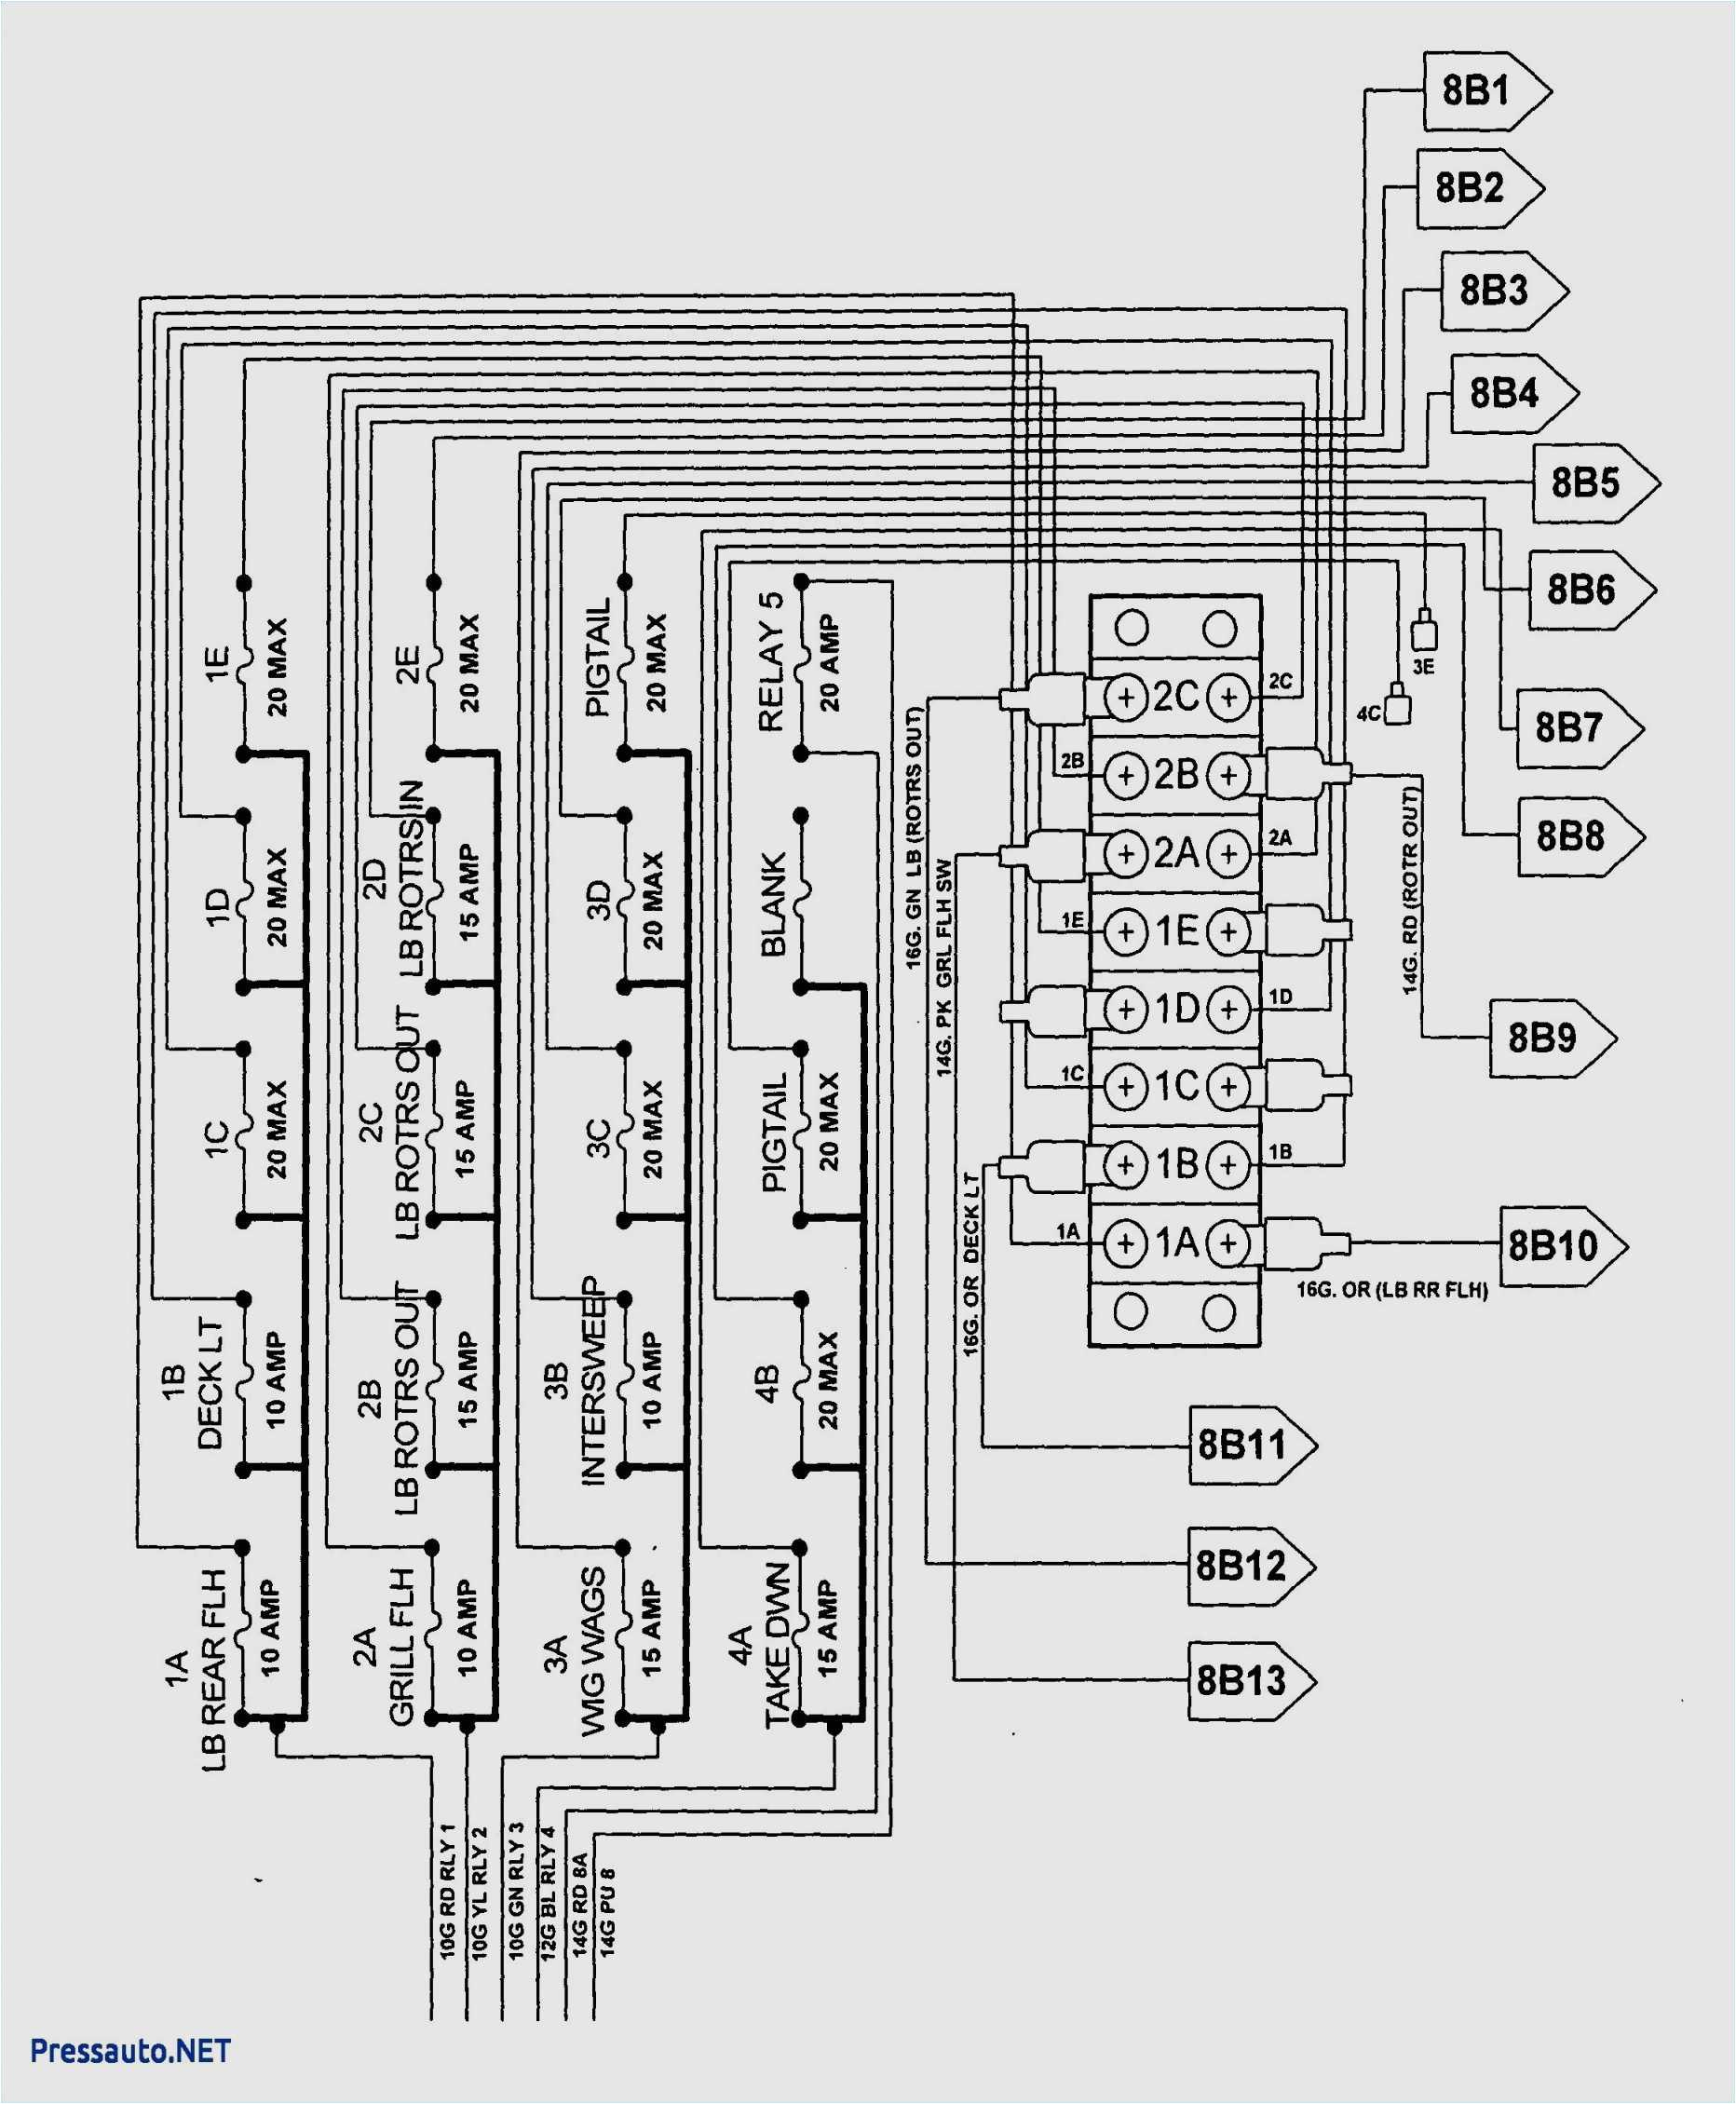 whelen 500 series light bar wiring diagram wiring diagramswhelen 500 series light bar wiring diagram strobe